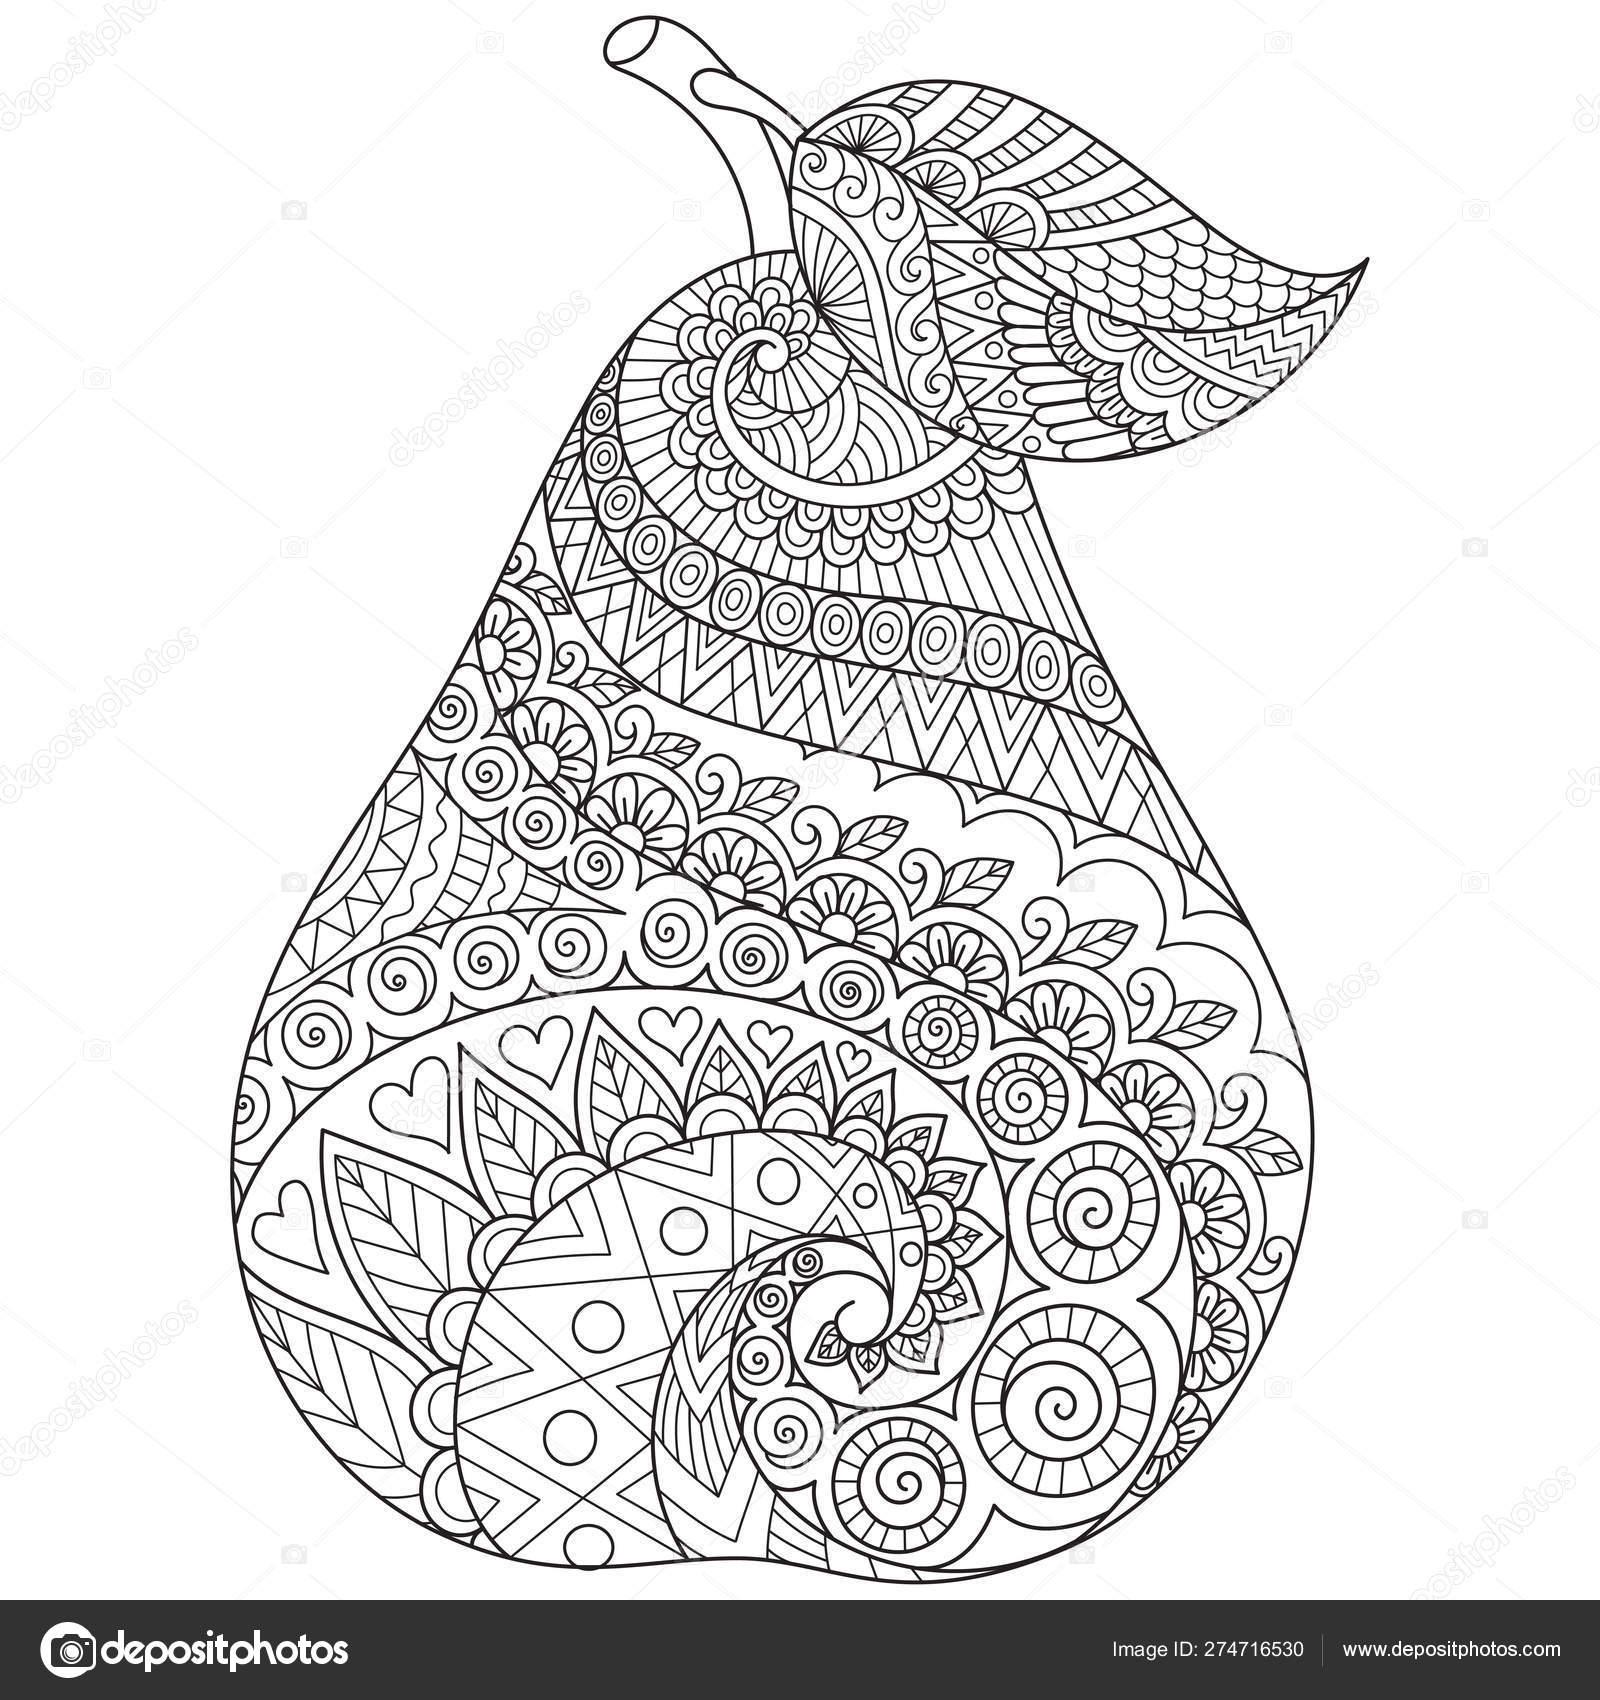 Line Art Drawing Pear Printing Stuffs Adult Coloring Book ...